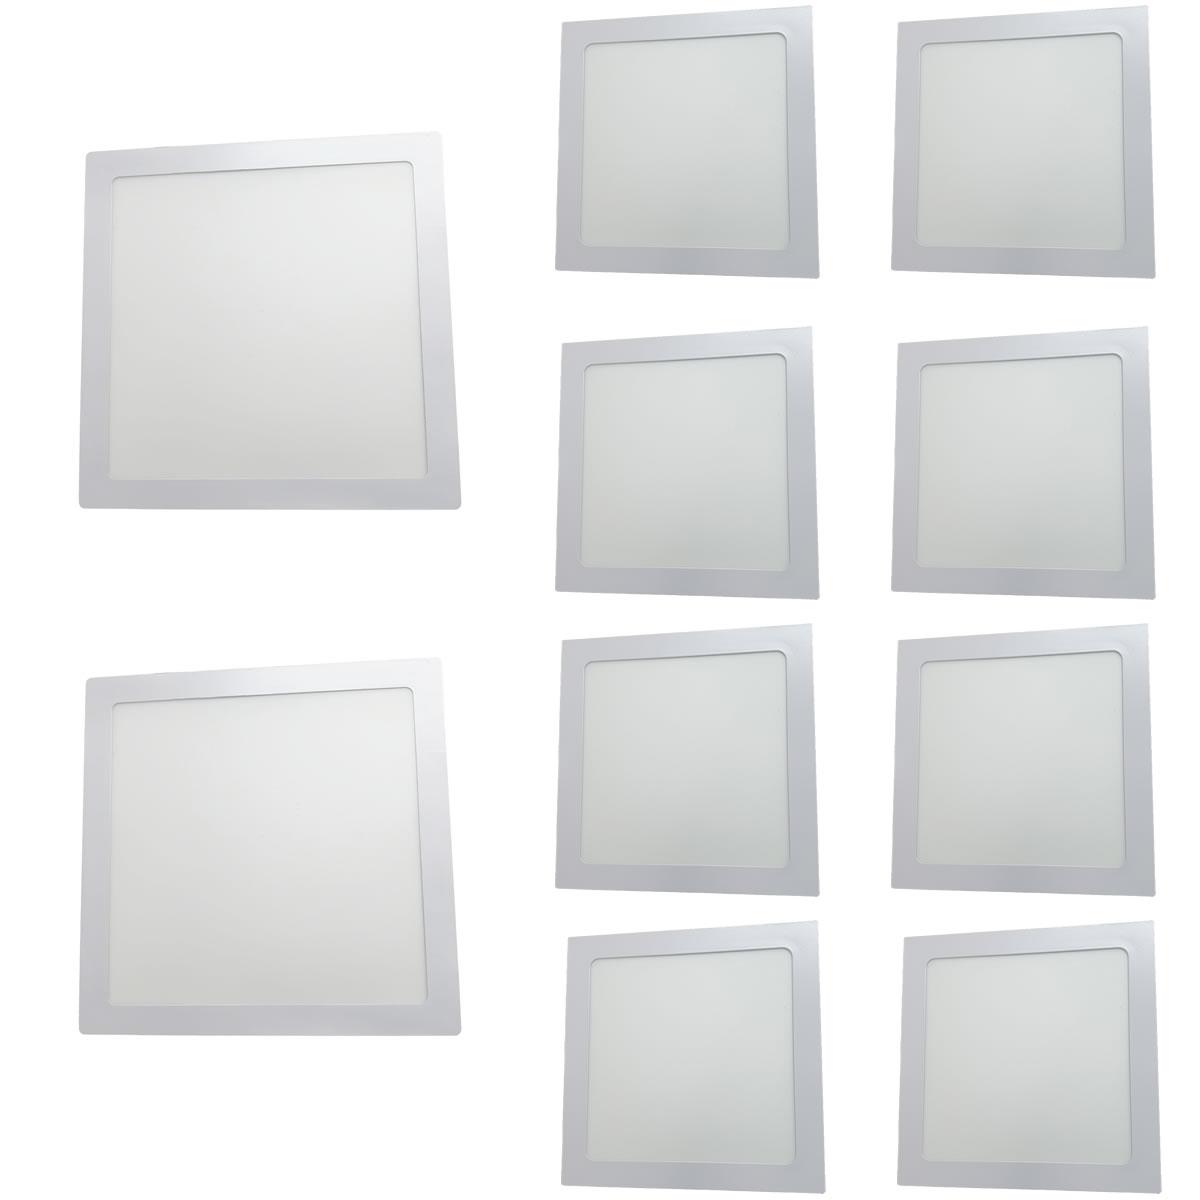 KIT 10 Painel Plafon LED 18W Quadrado Luz Branca Quente de Embutir